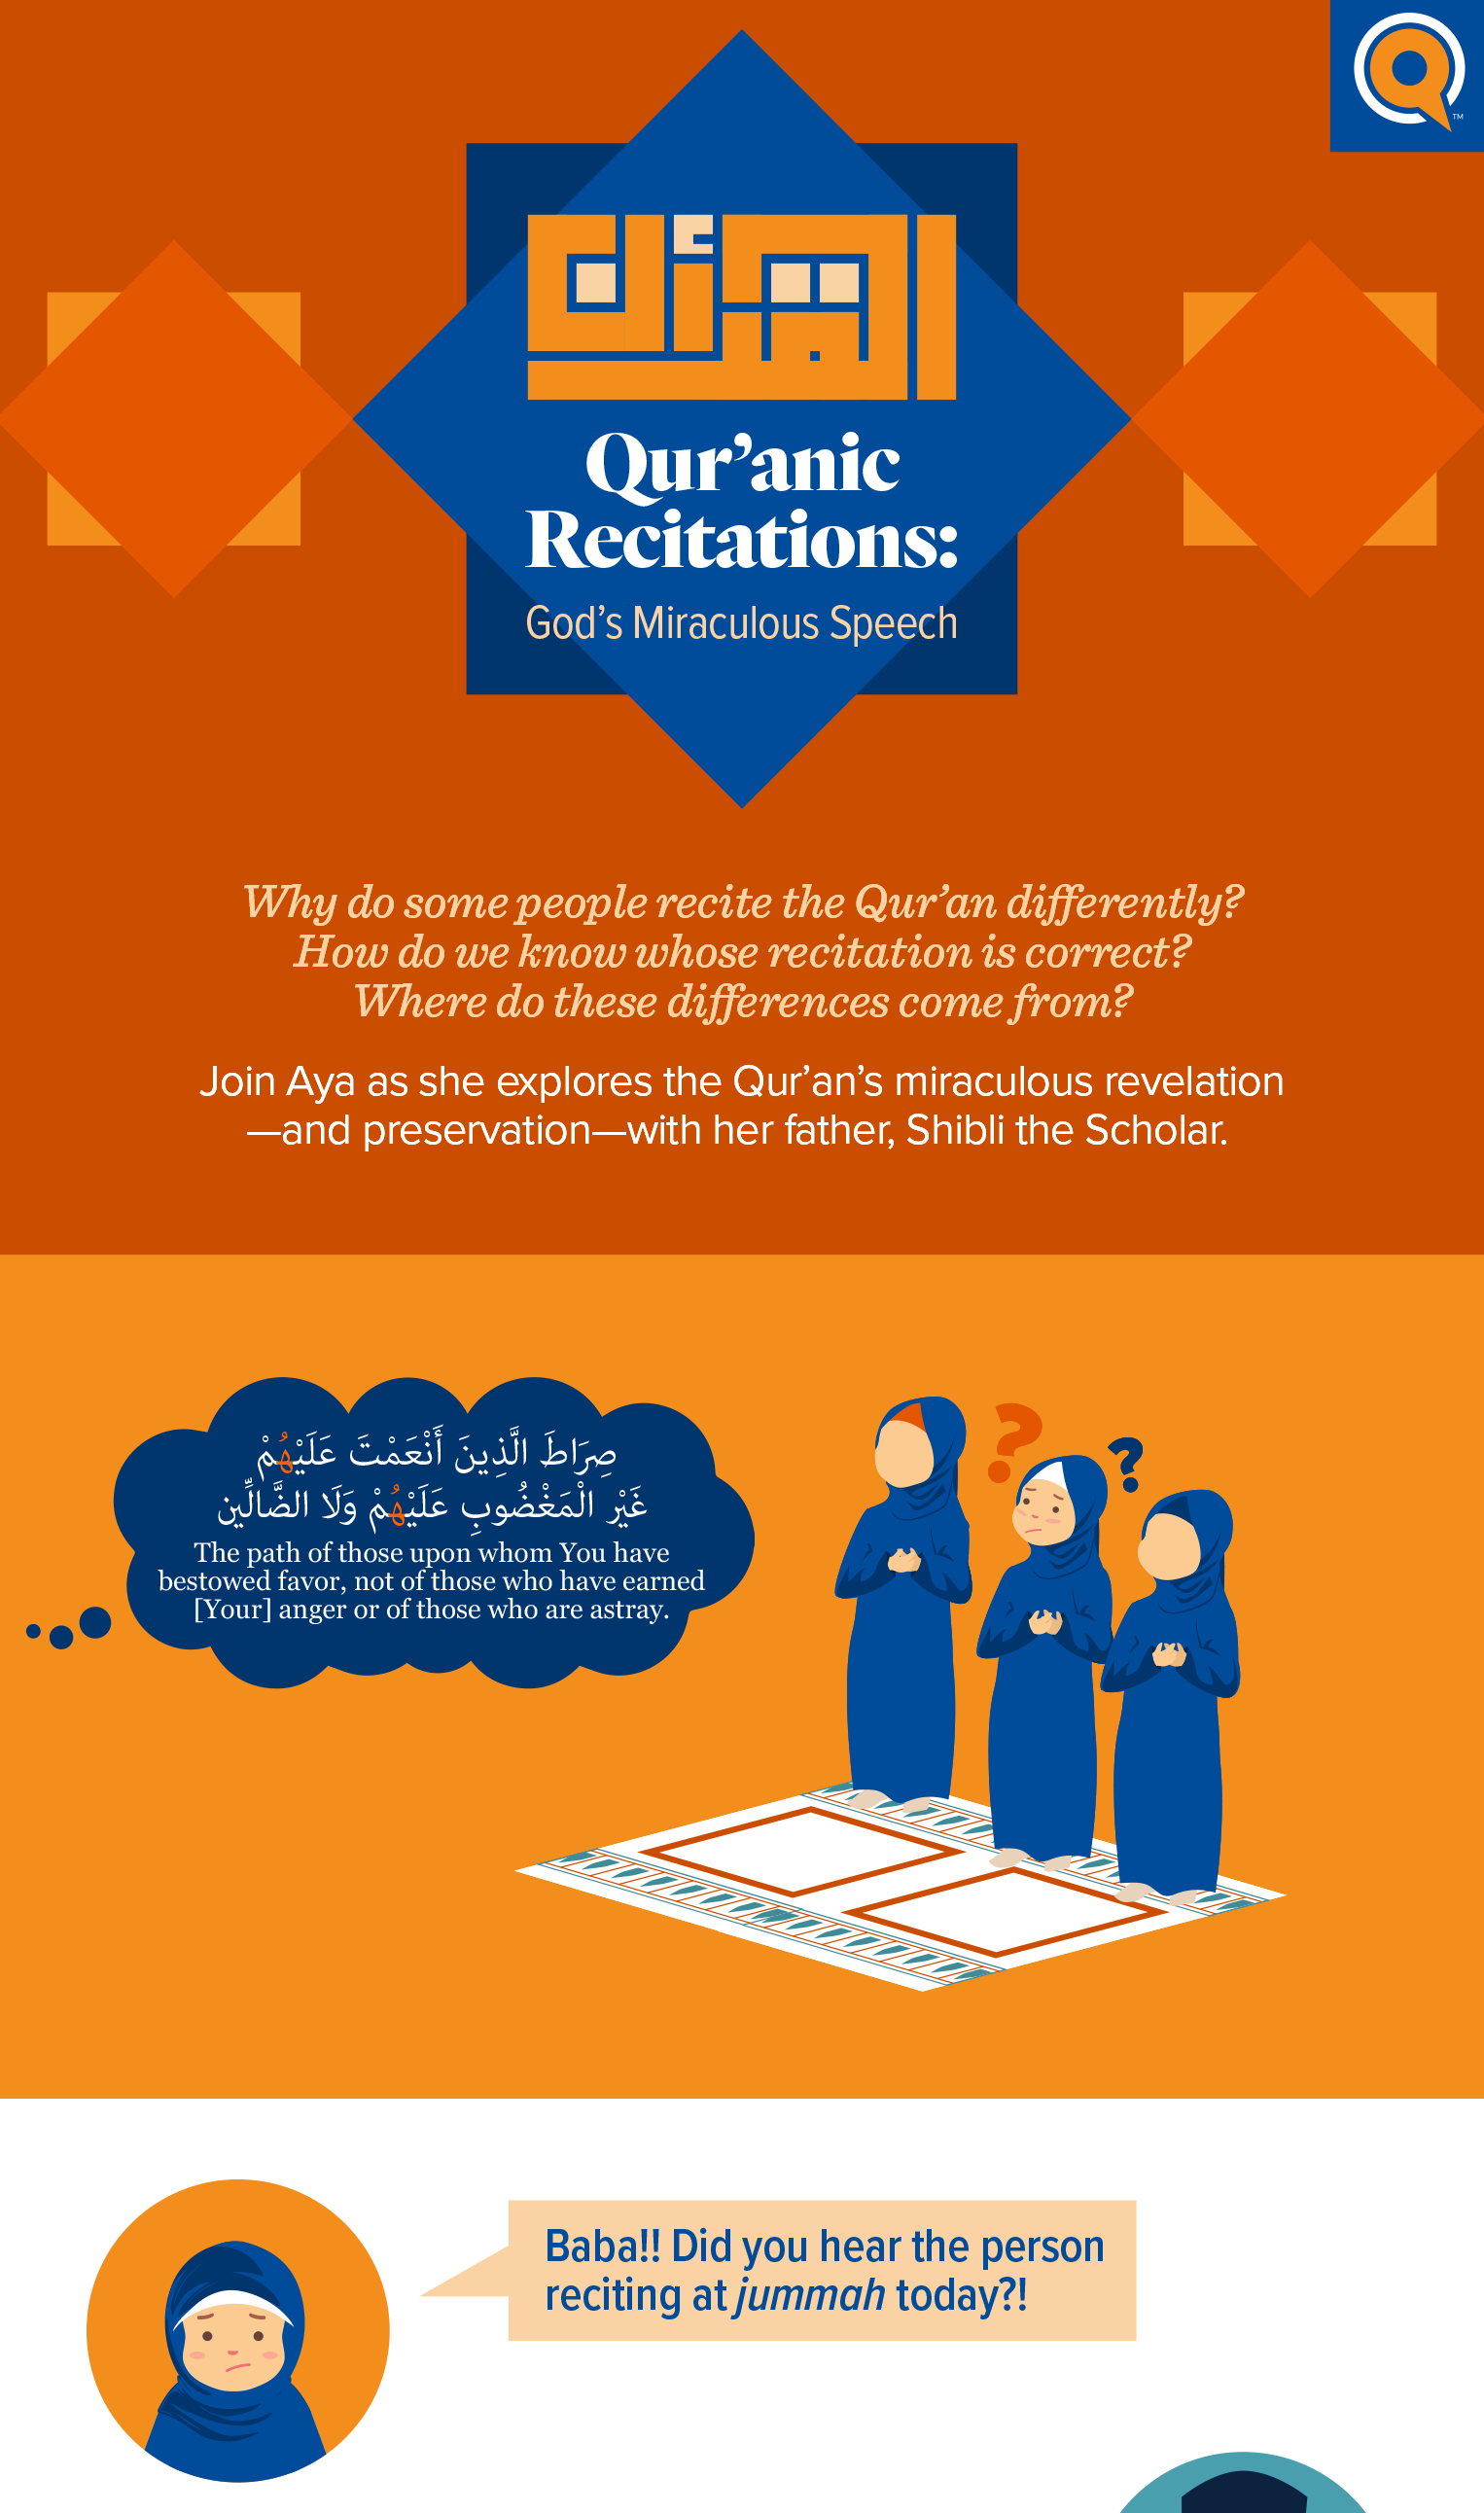 Qur'anic Recitations: God's Miraculous Speech | Infographic